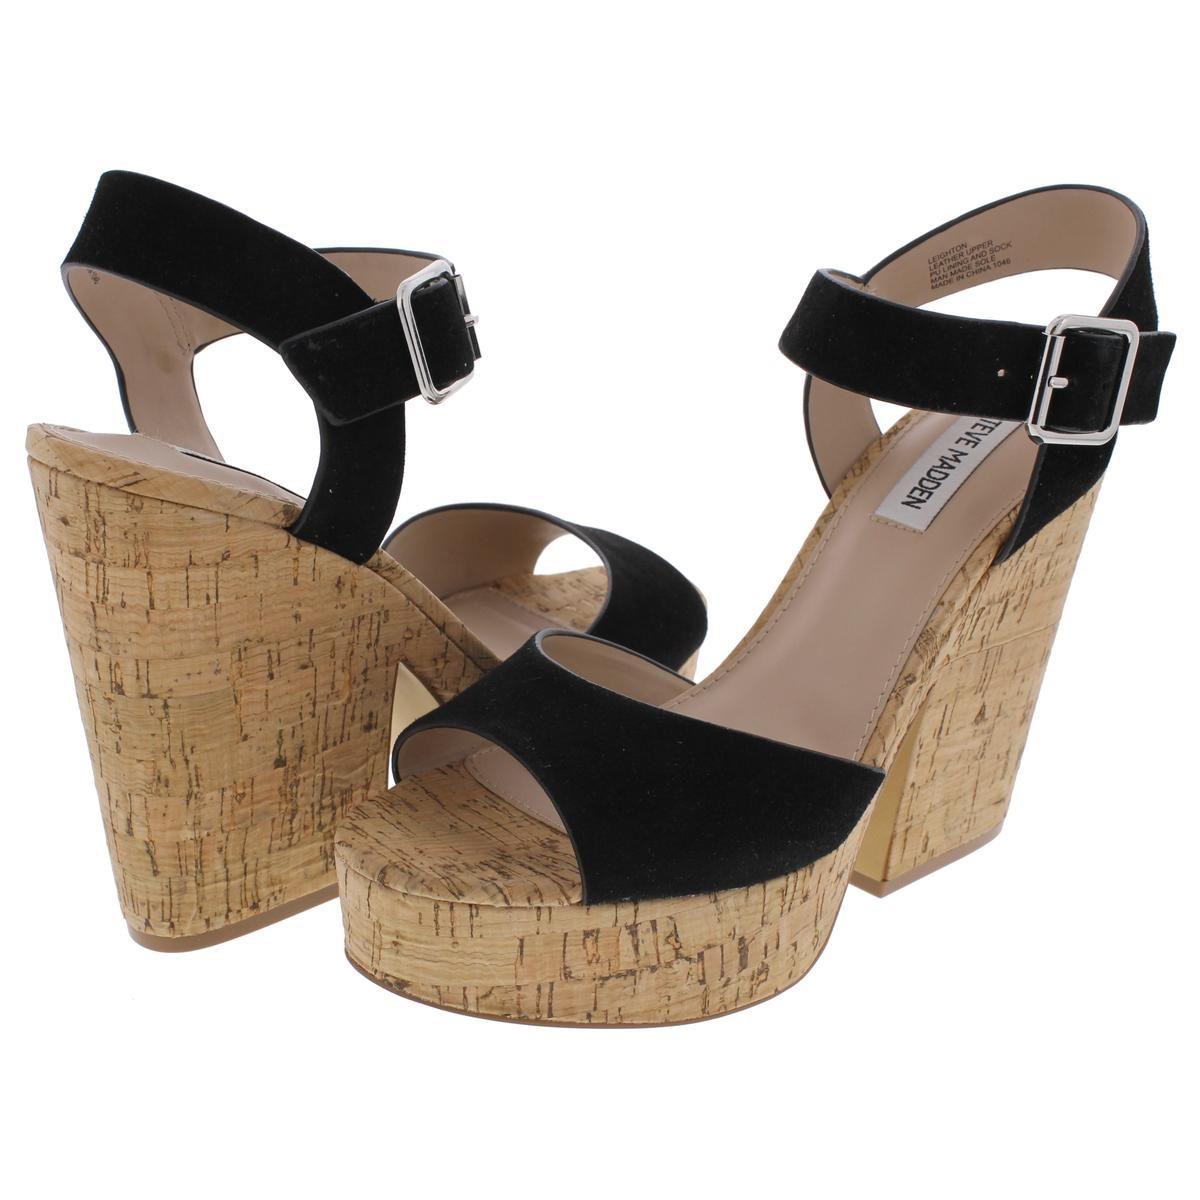 688ea379ca2 Steve Madden Womens Leighton Platform Sandals